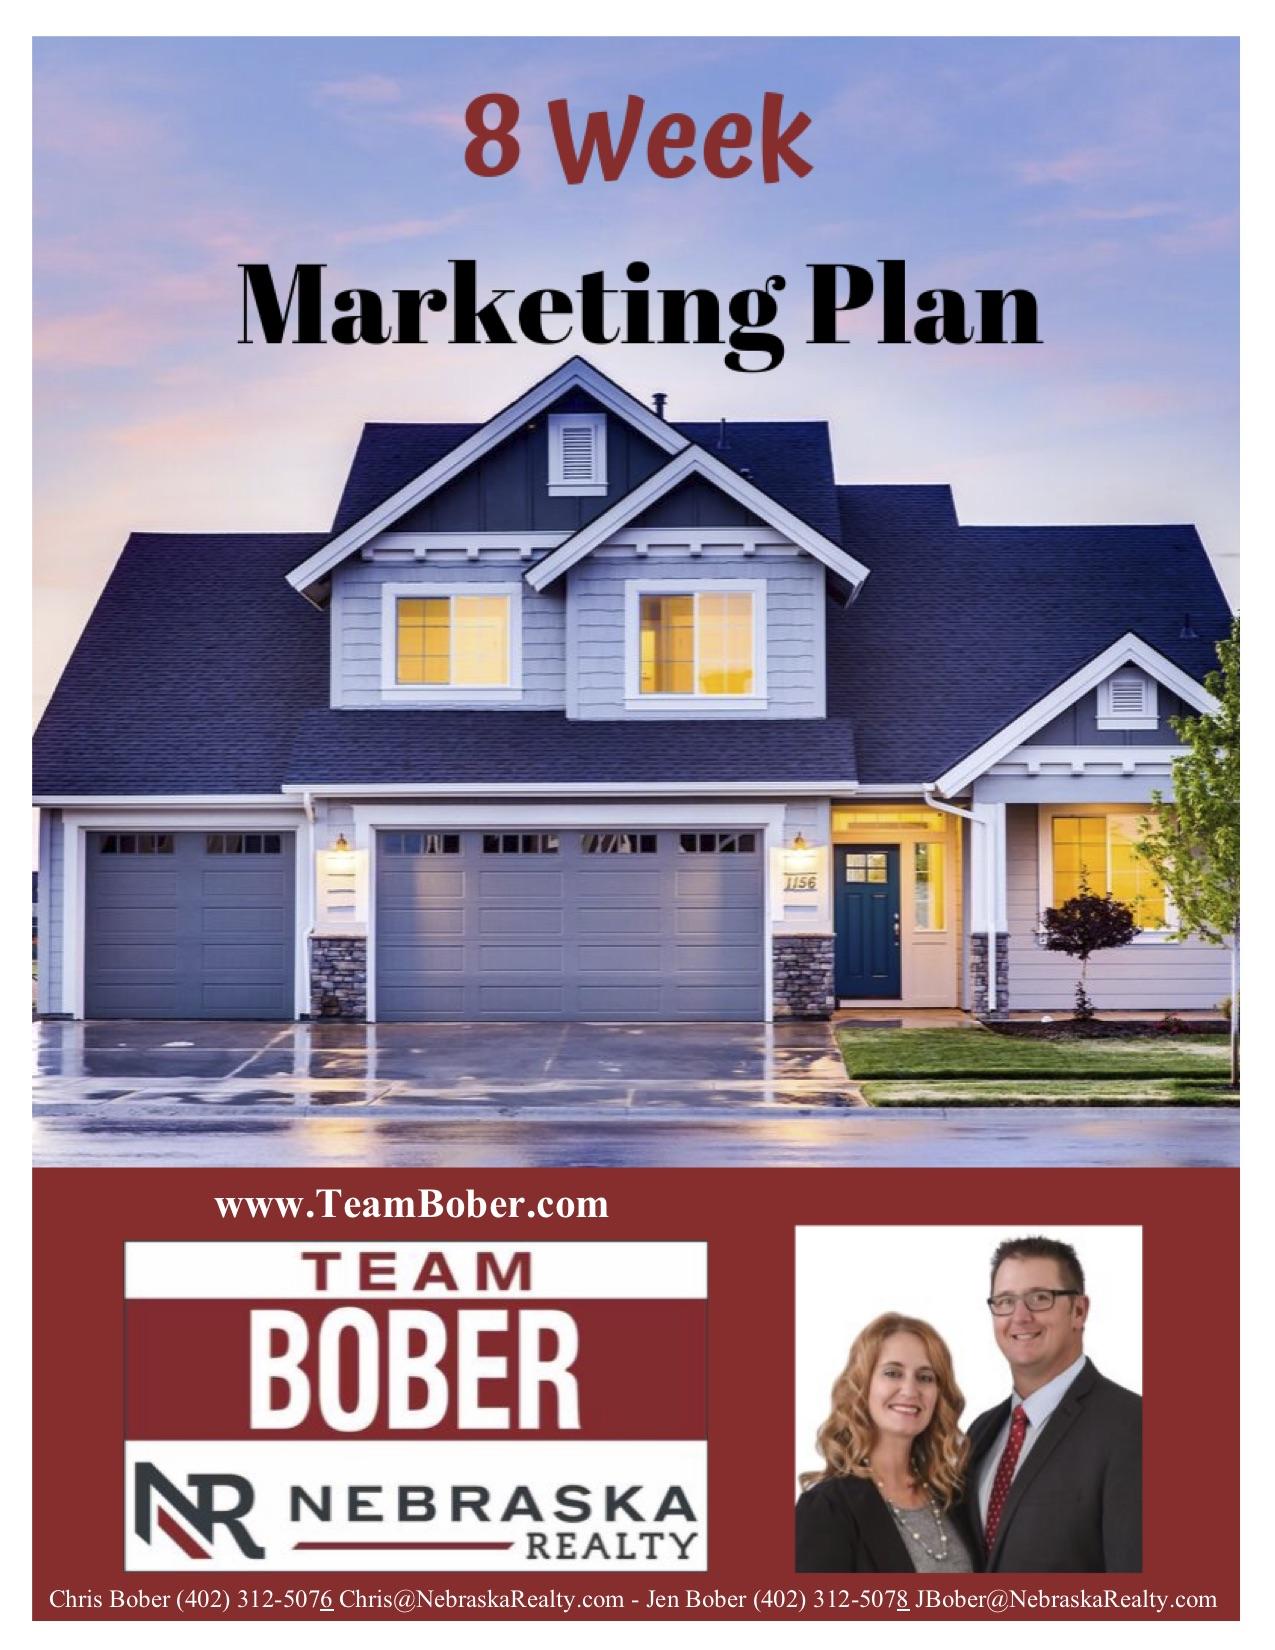 8 Week Marketing Plan1.jpg